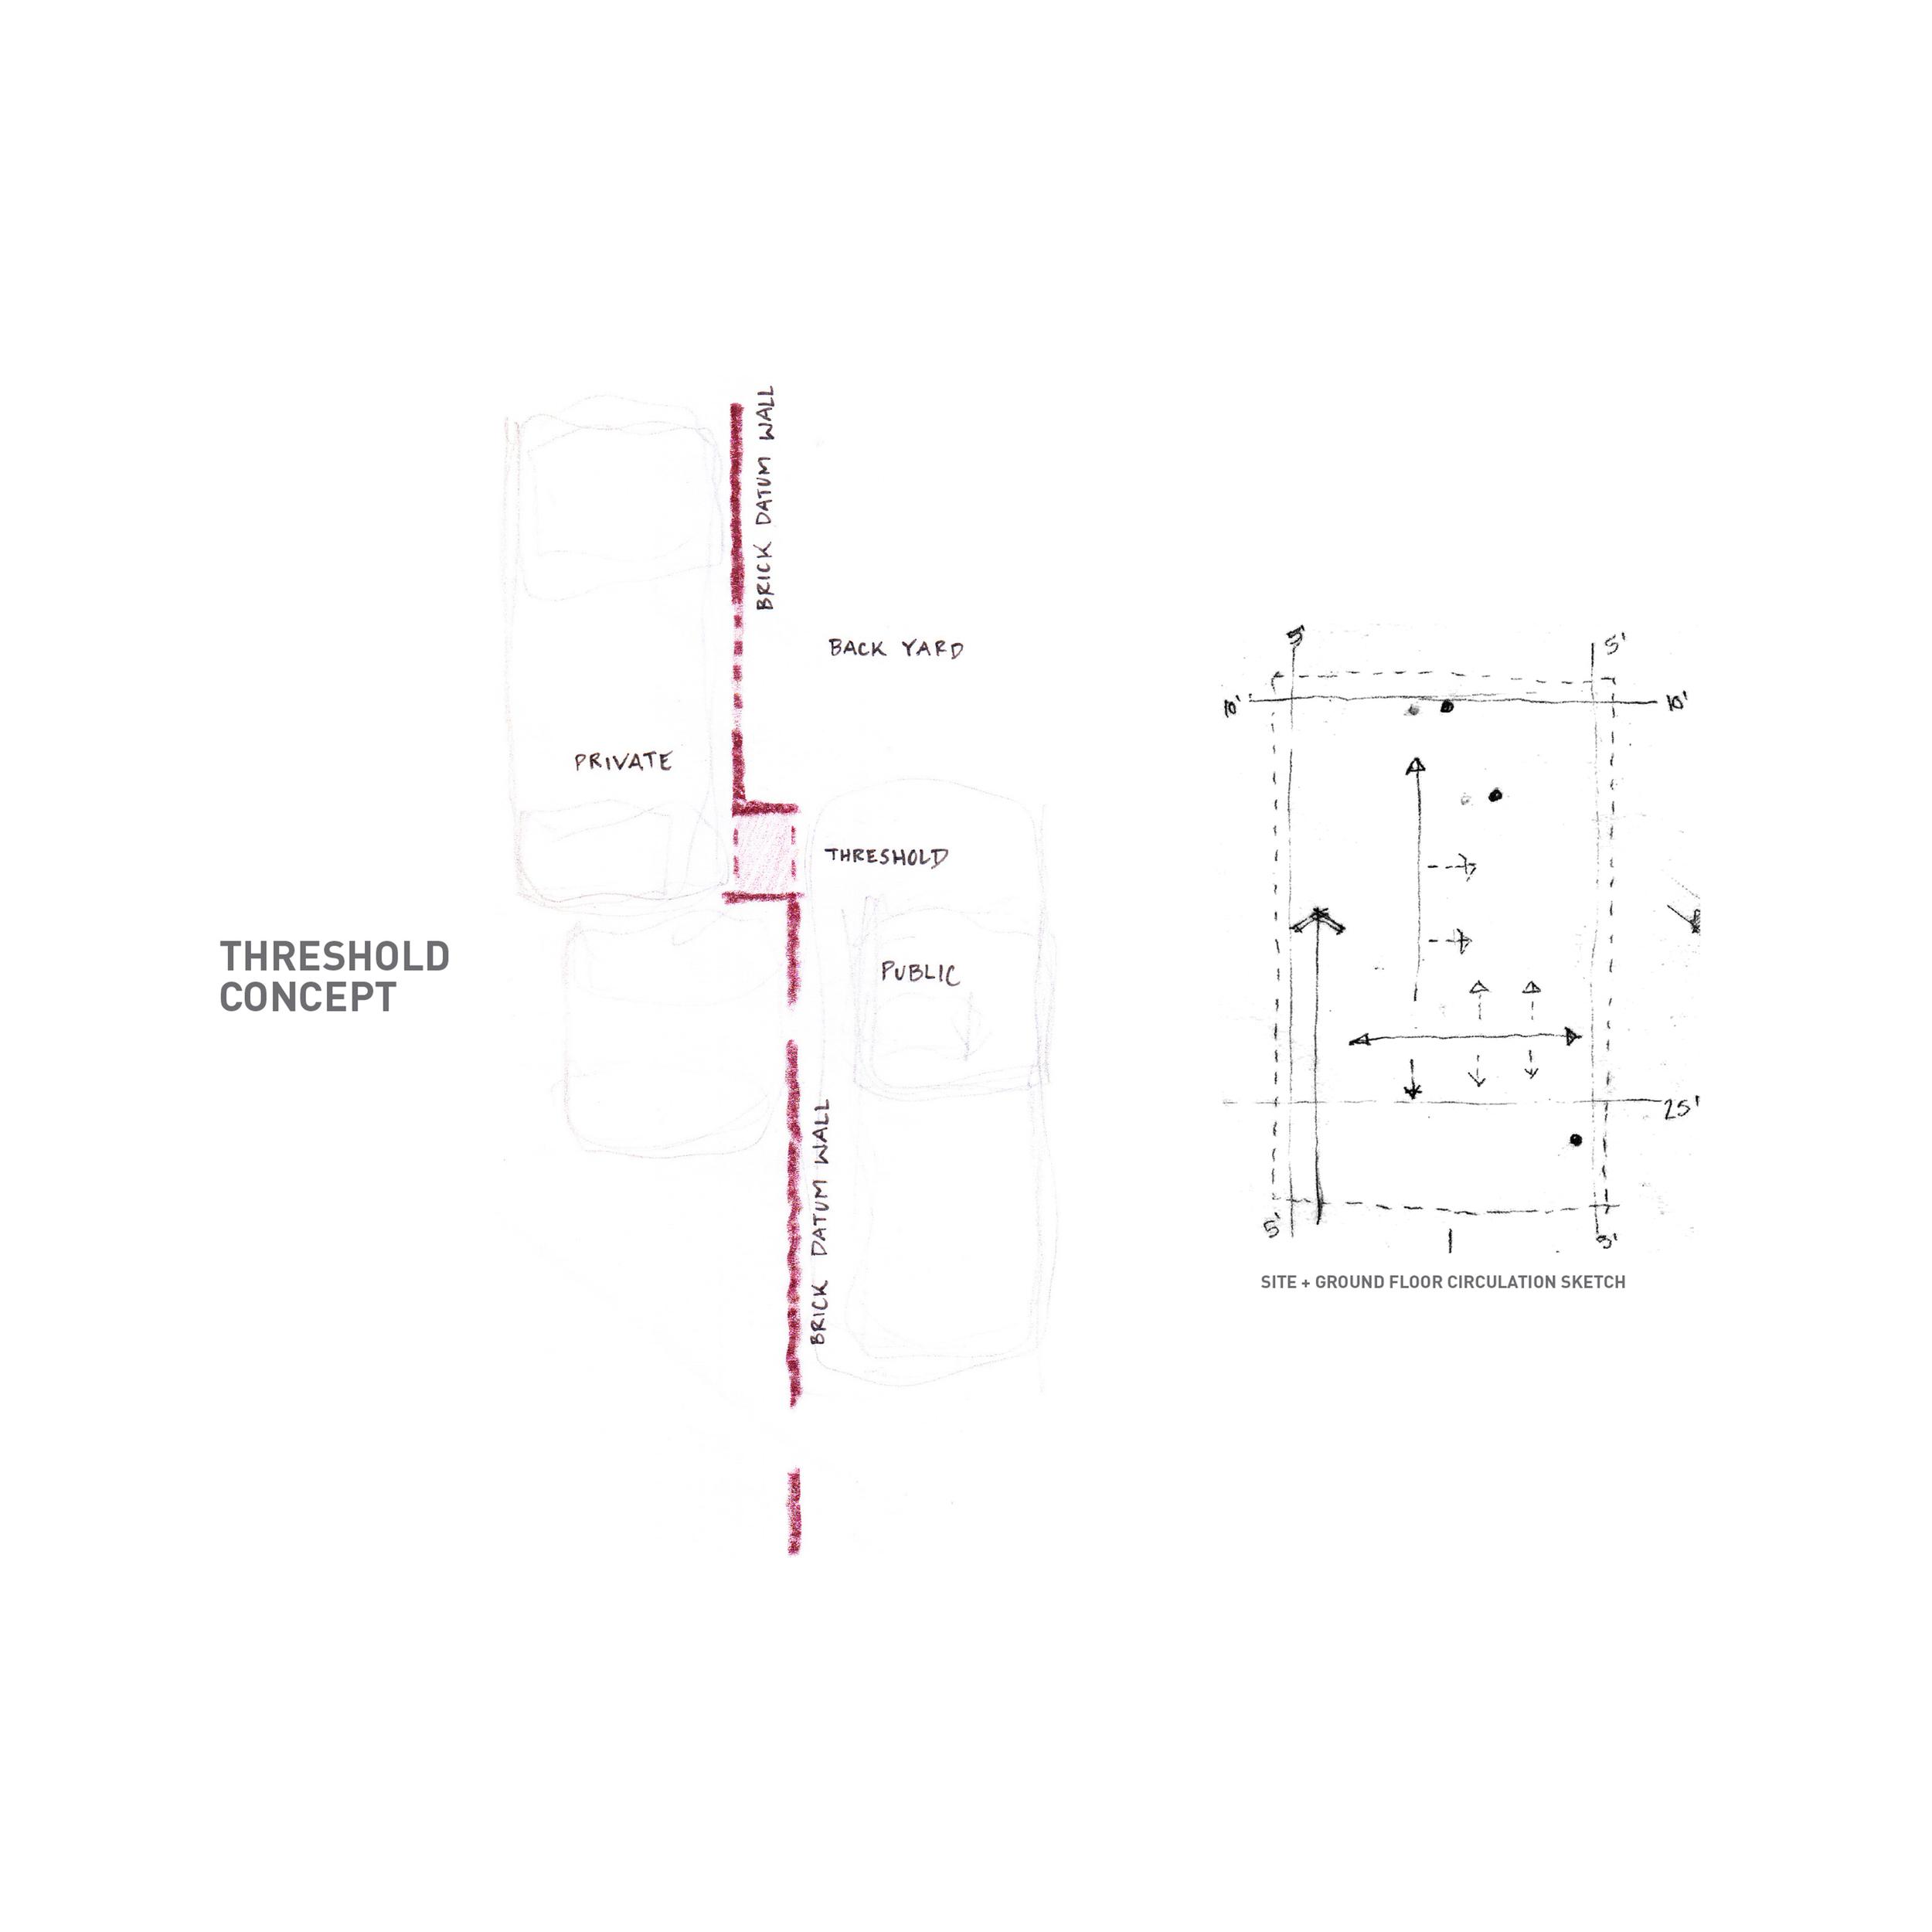 Threshold Concept.jpg